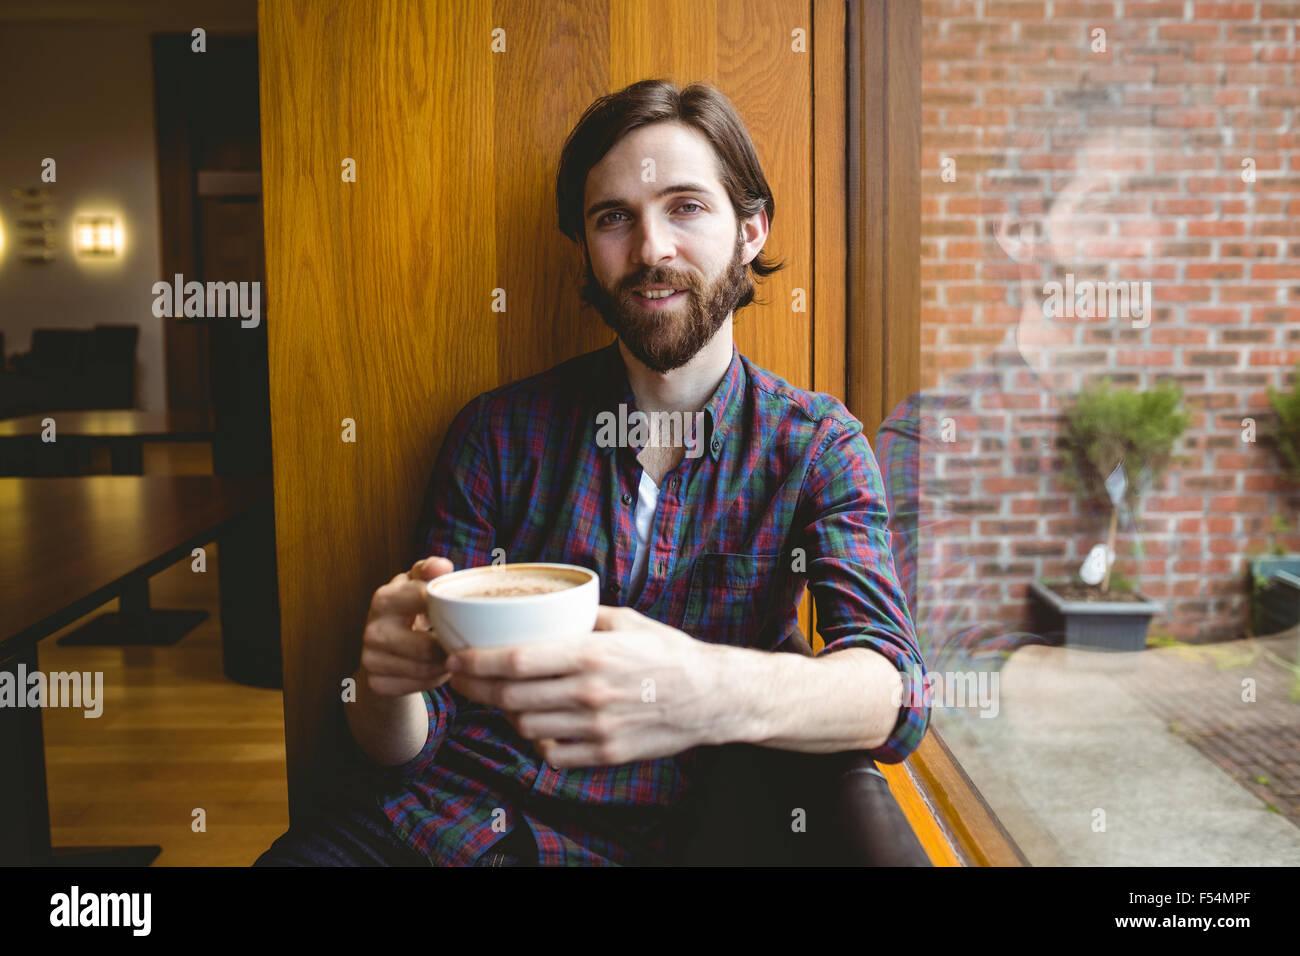 Hipster estudiante con café en la cantina Imagen De Stock